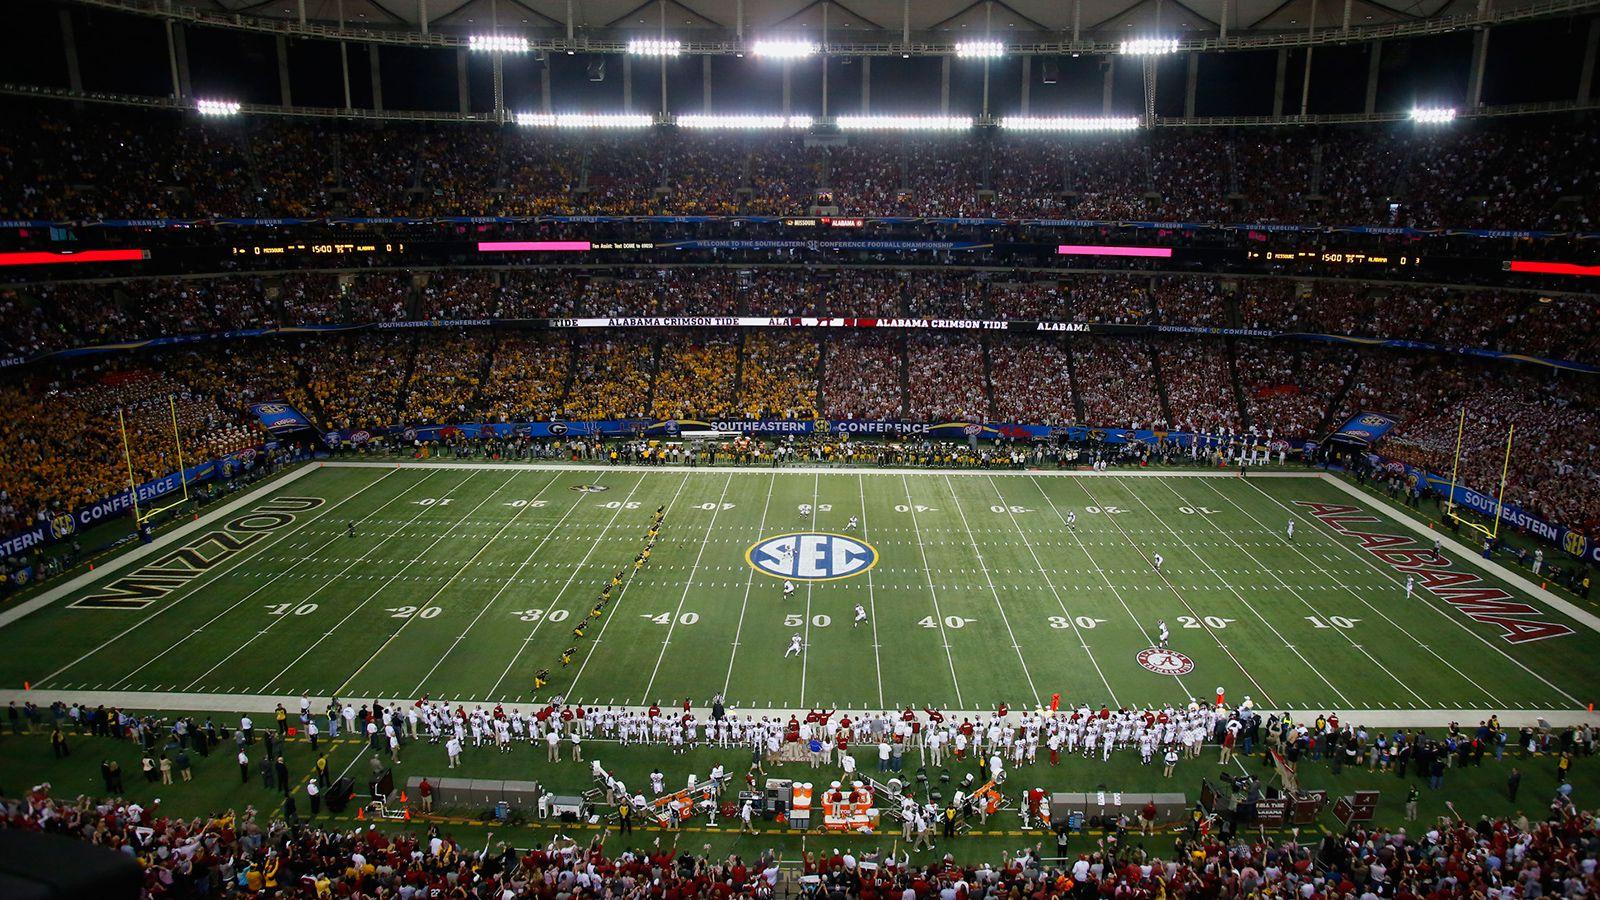 Episode 3: 2015 Battle for Atlanta